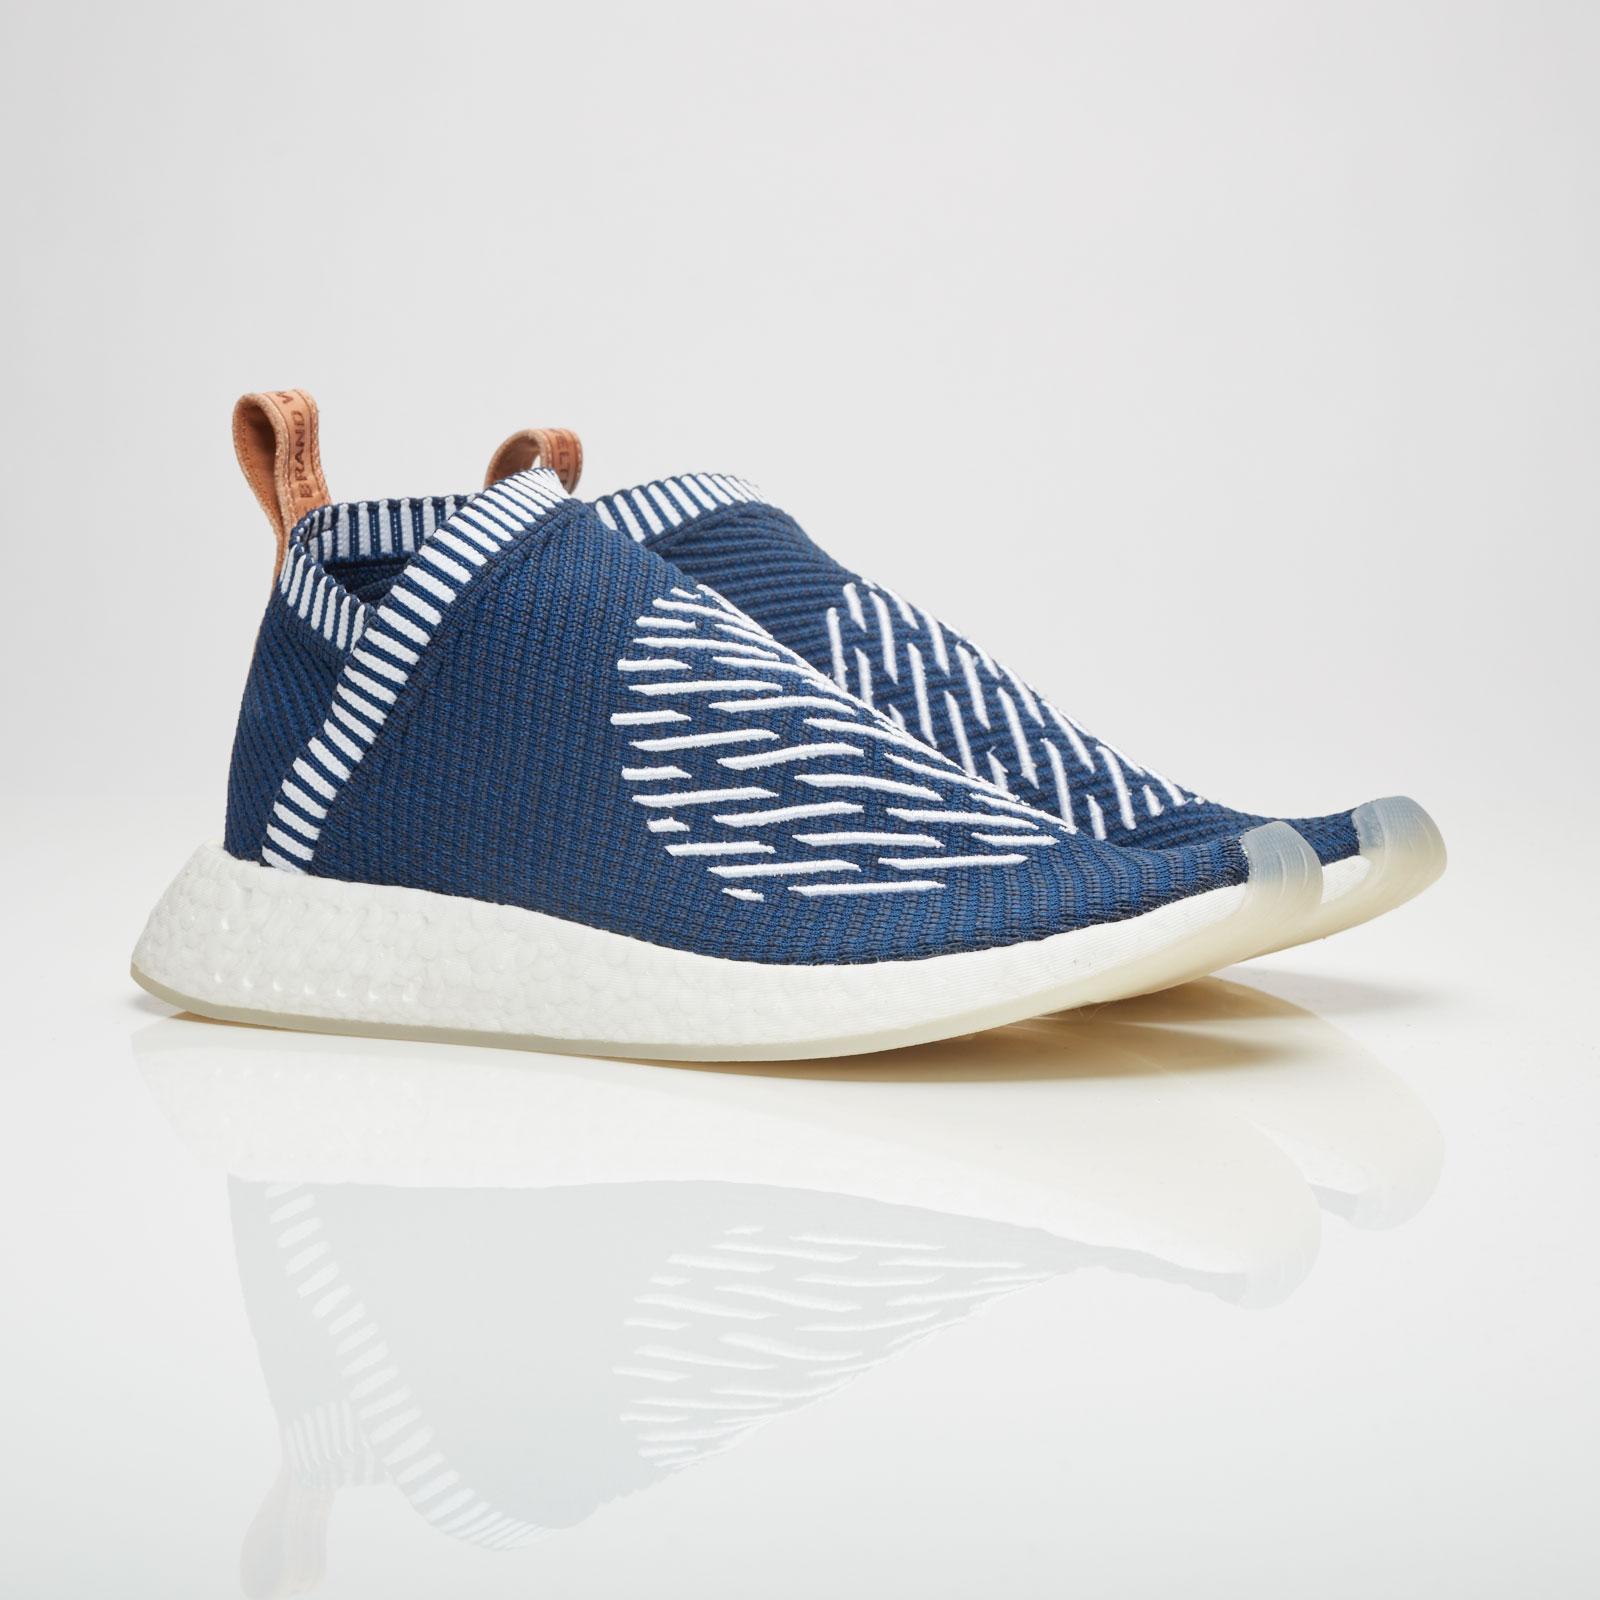 Sneakers amp; Adidas Streetwear Ba7189 Sneakersnstuff Pk Nmd Cs2 6YX1zB